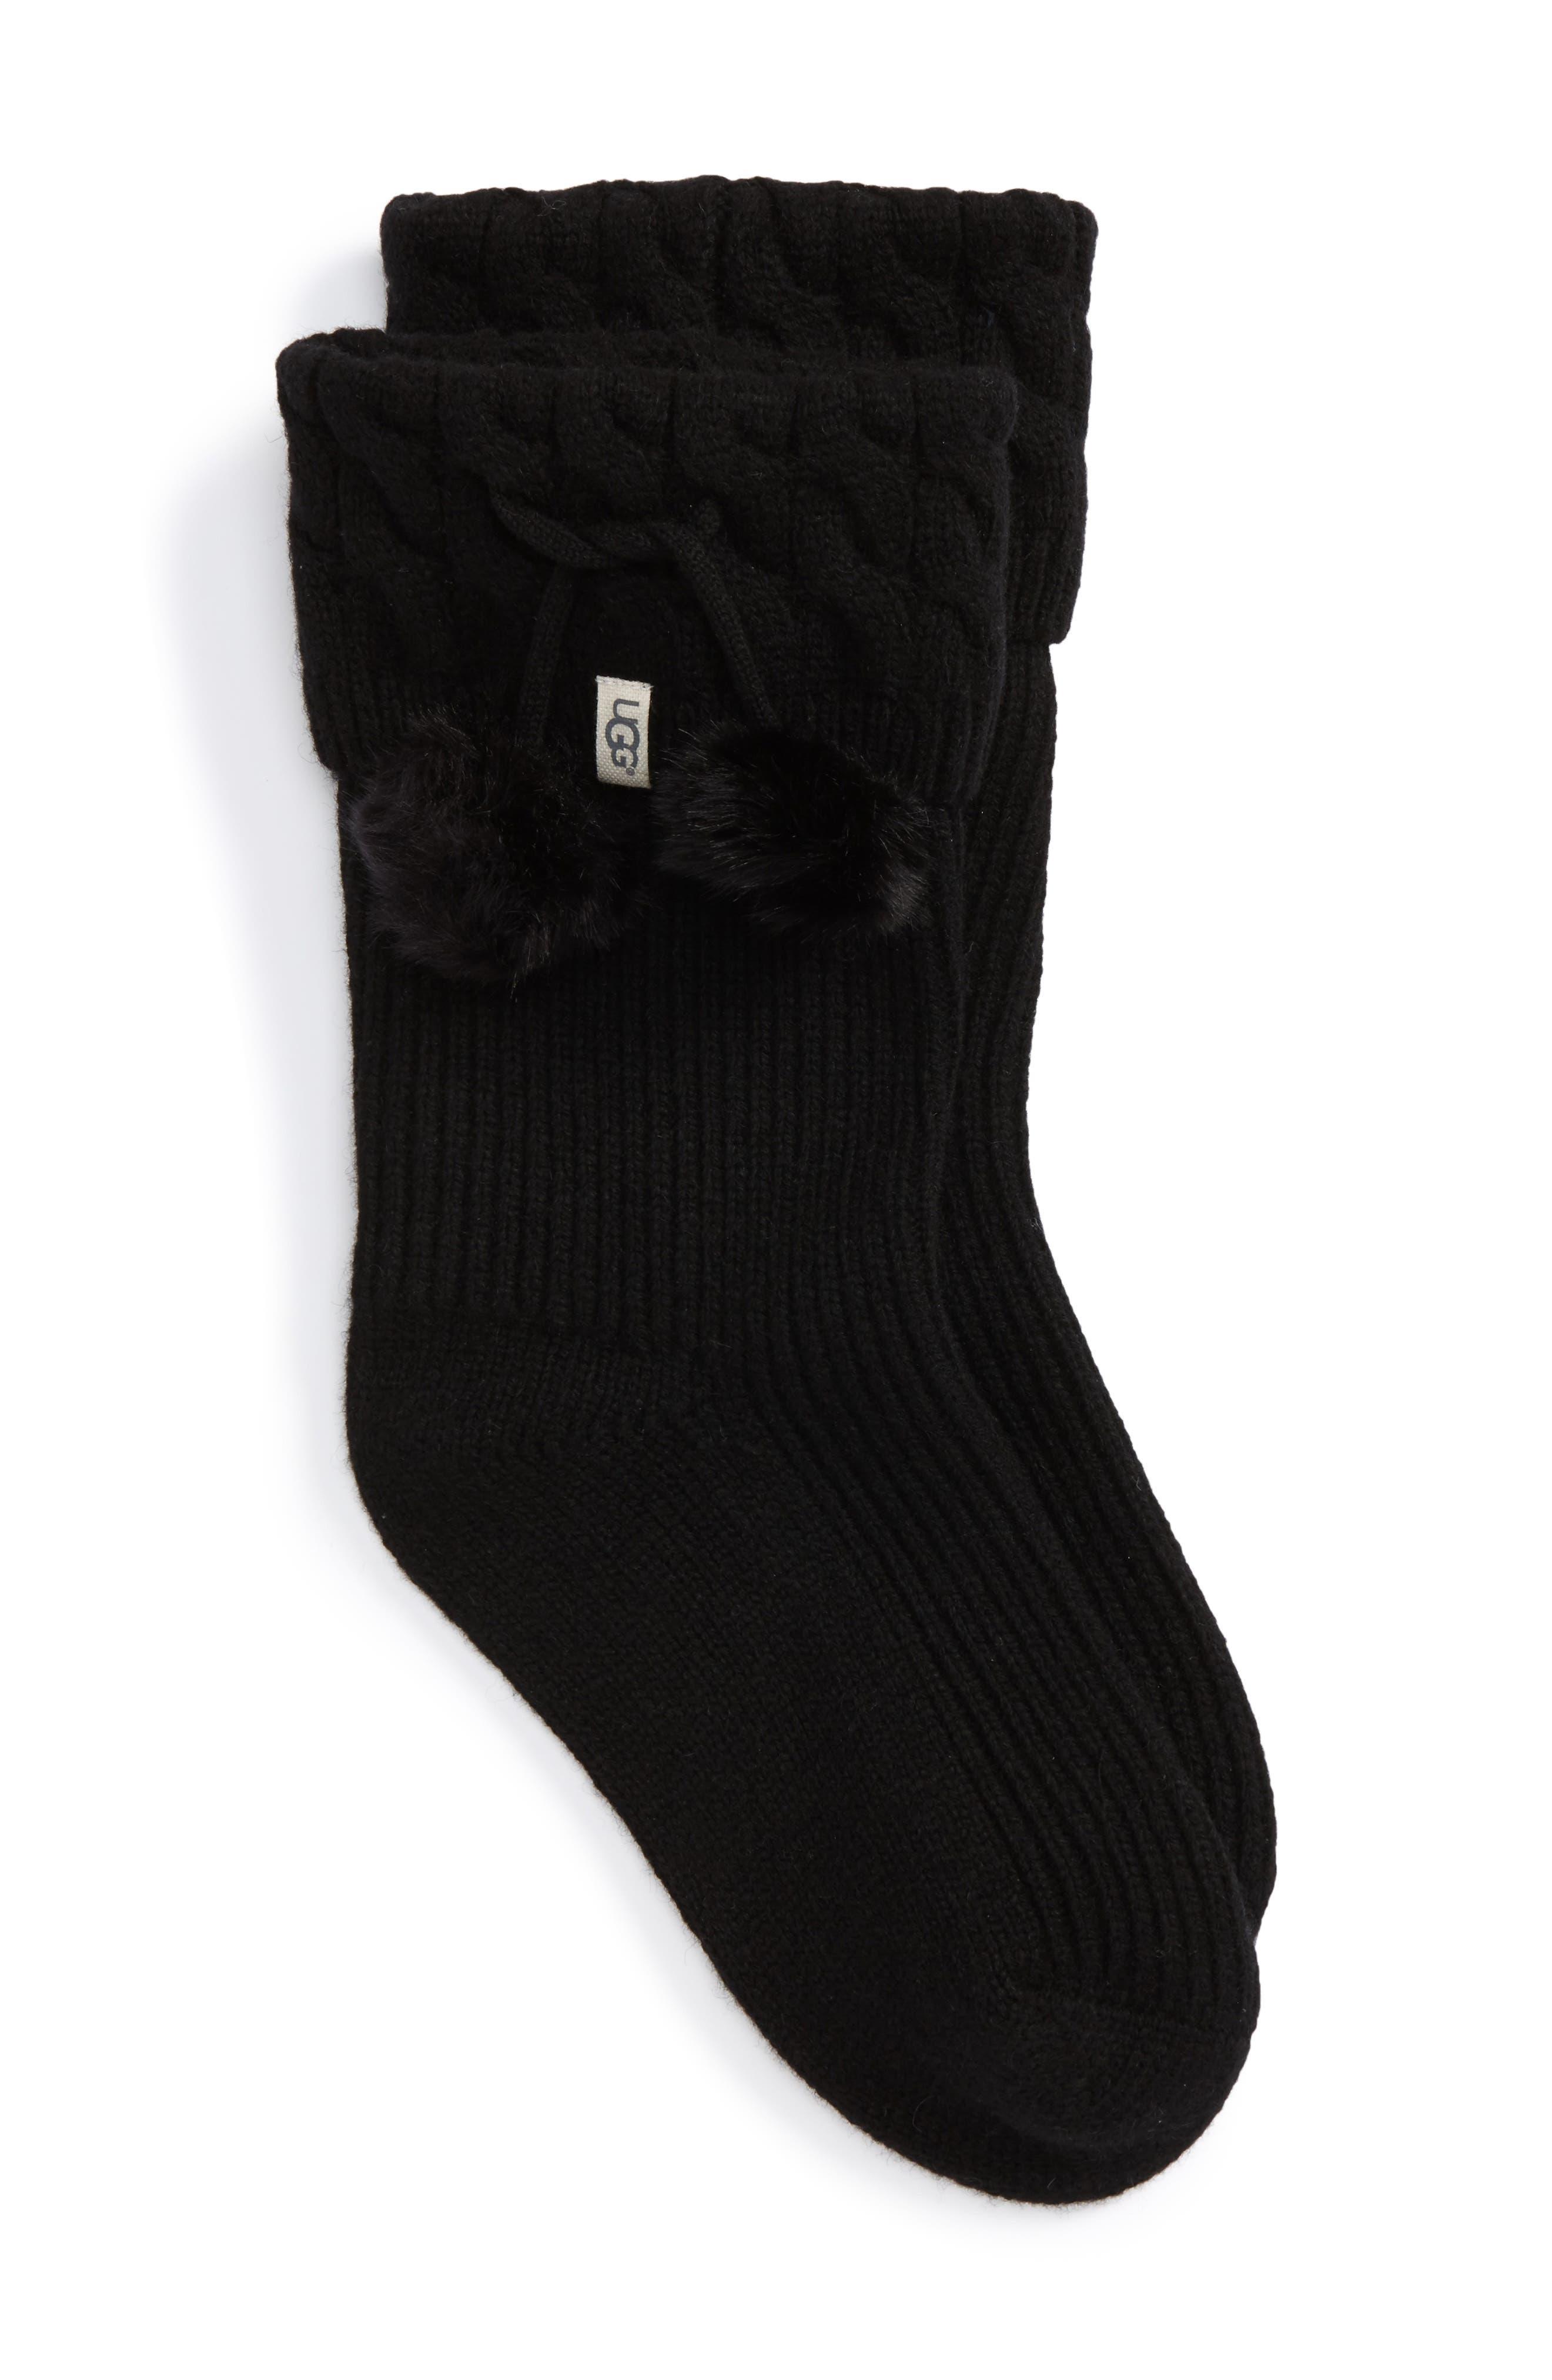 UGGpure<sup>™</sup> Pompom Short Rain Boot Sock,                             Main thumbnail 1, color,                             001